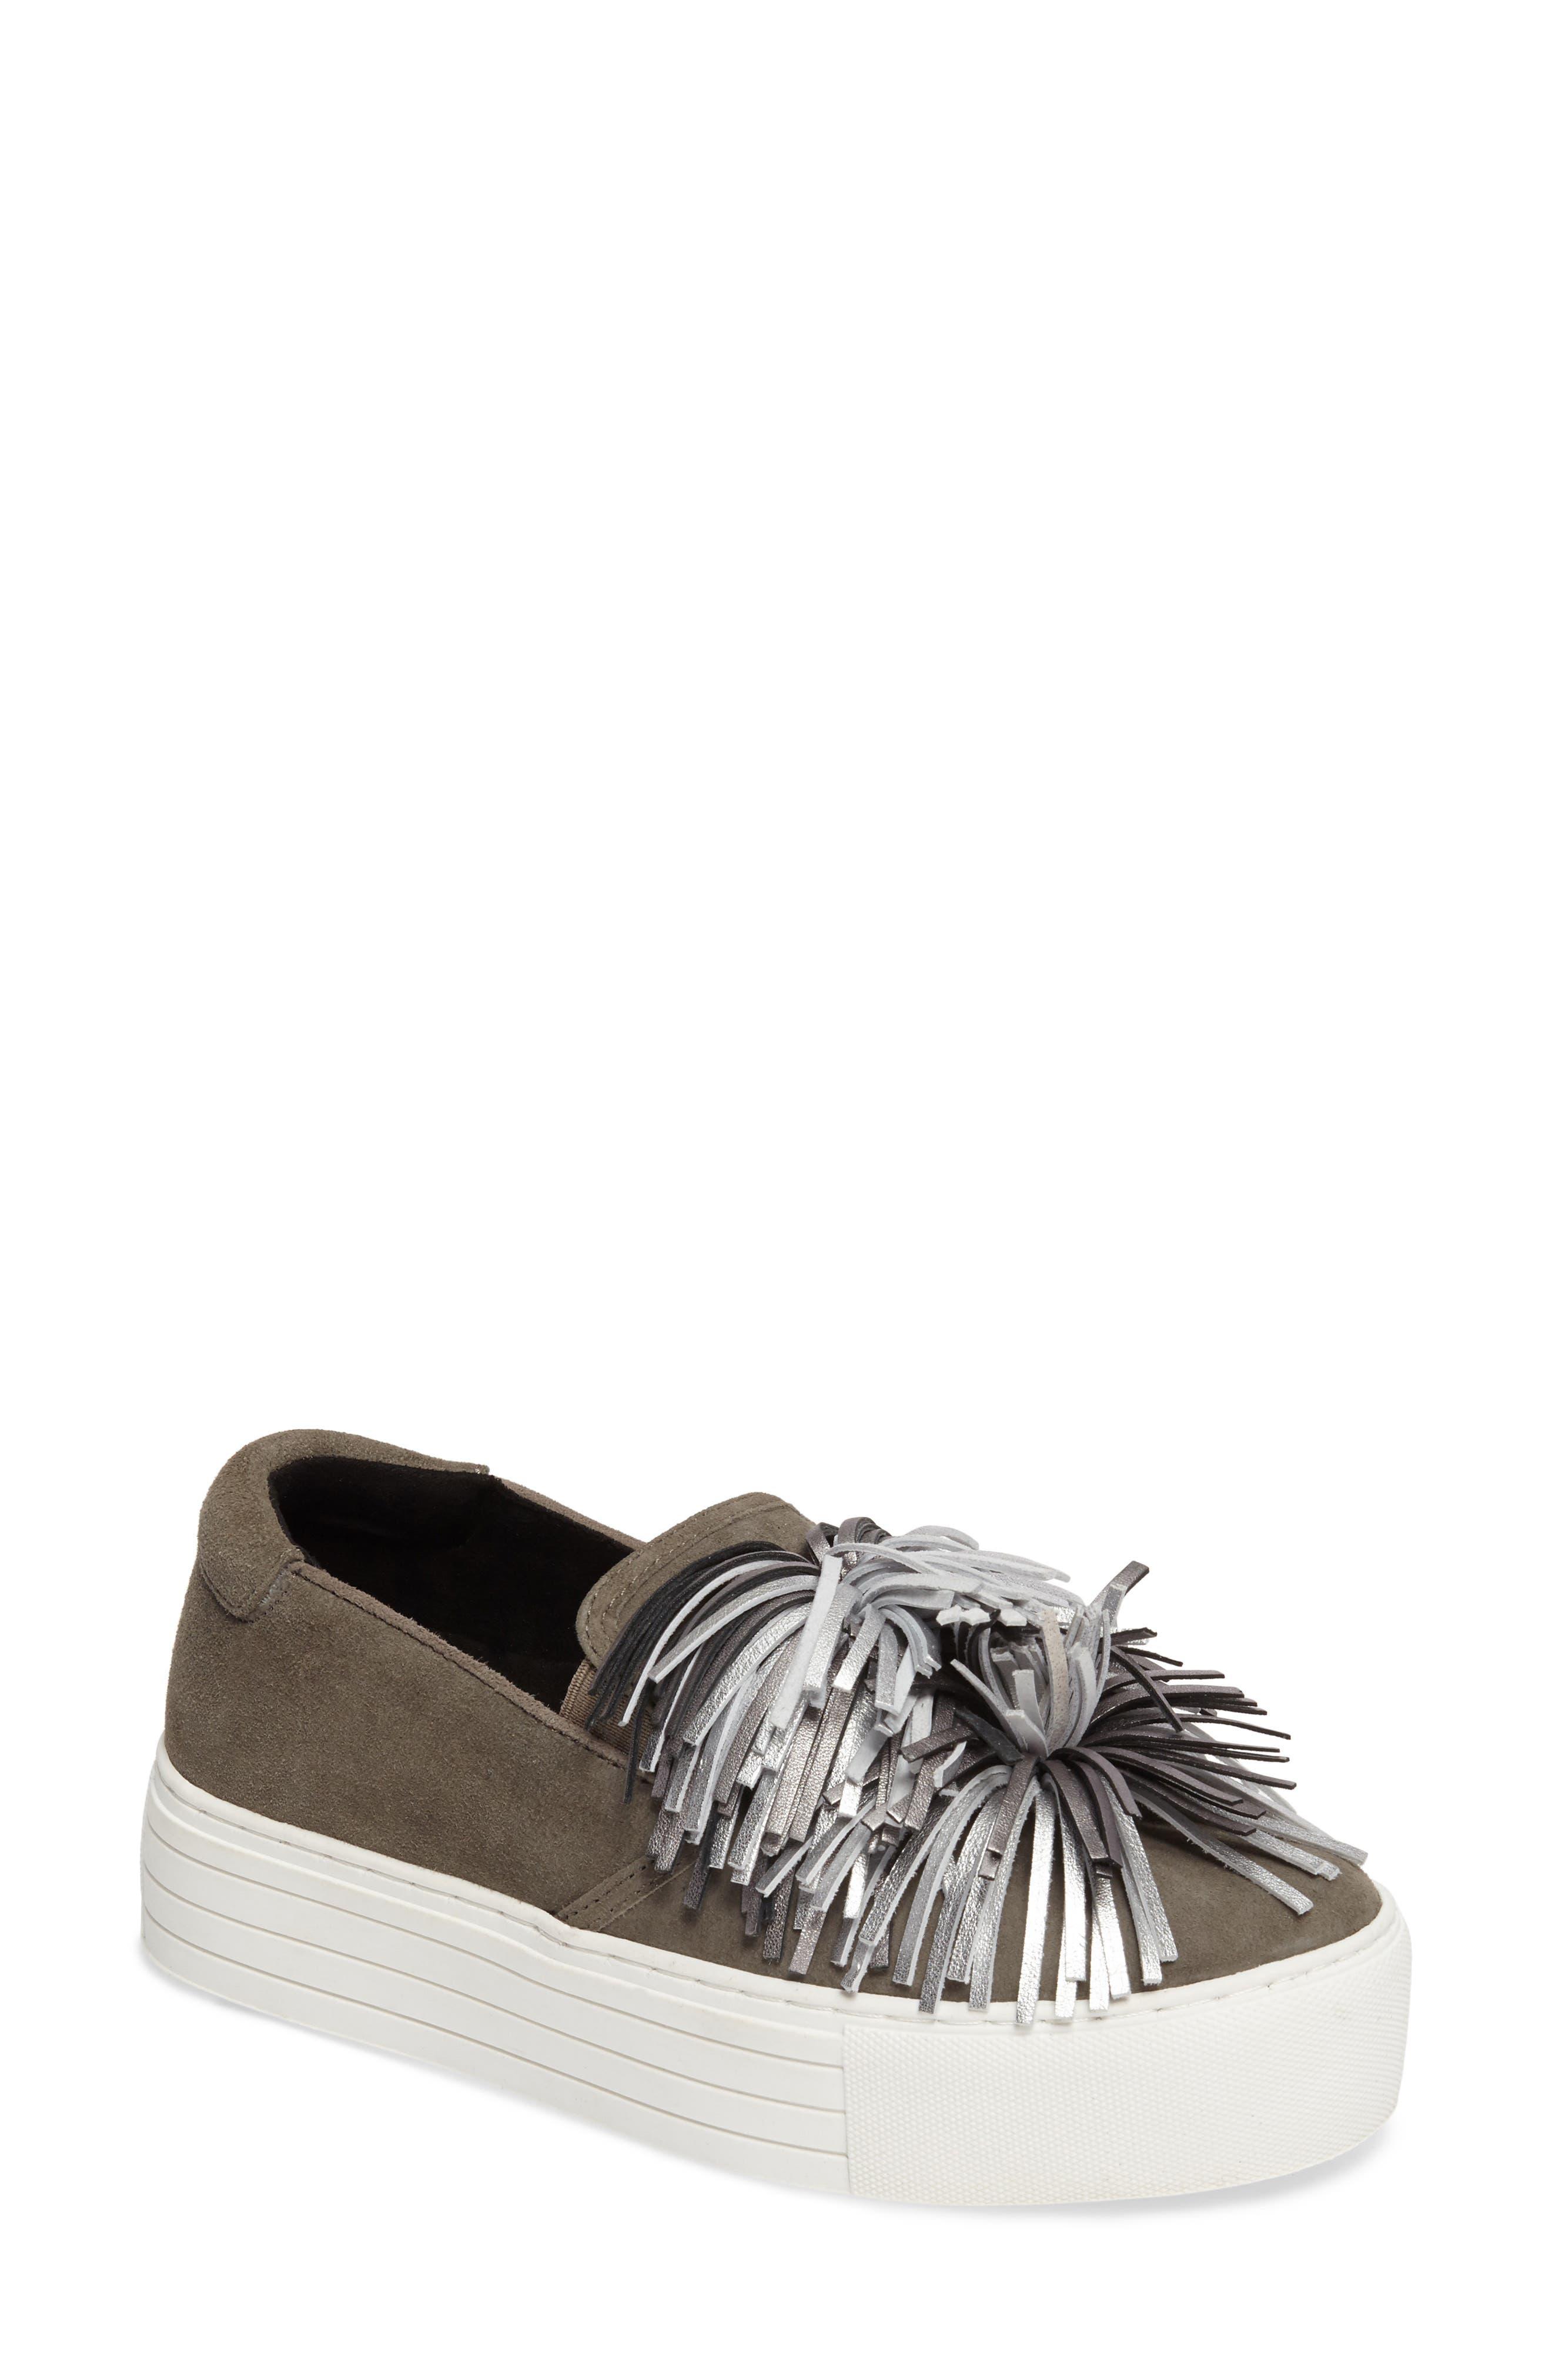 Jayson Pom Platform Sneaker,                             Main thumbnail 1, color,                             090